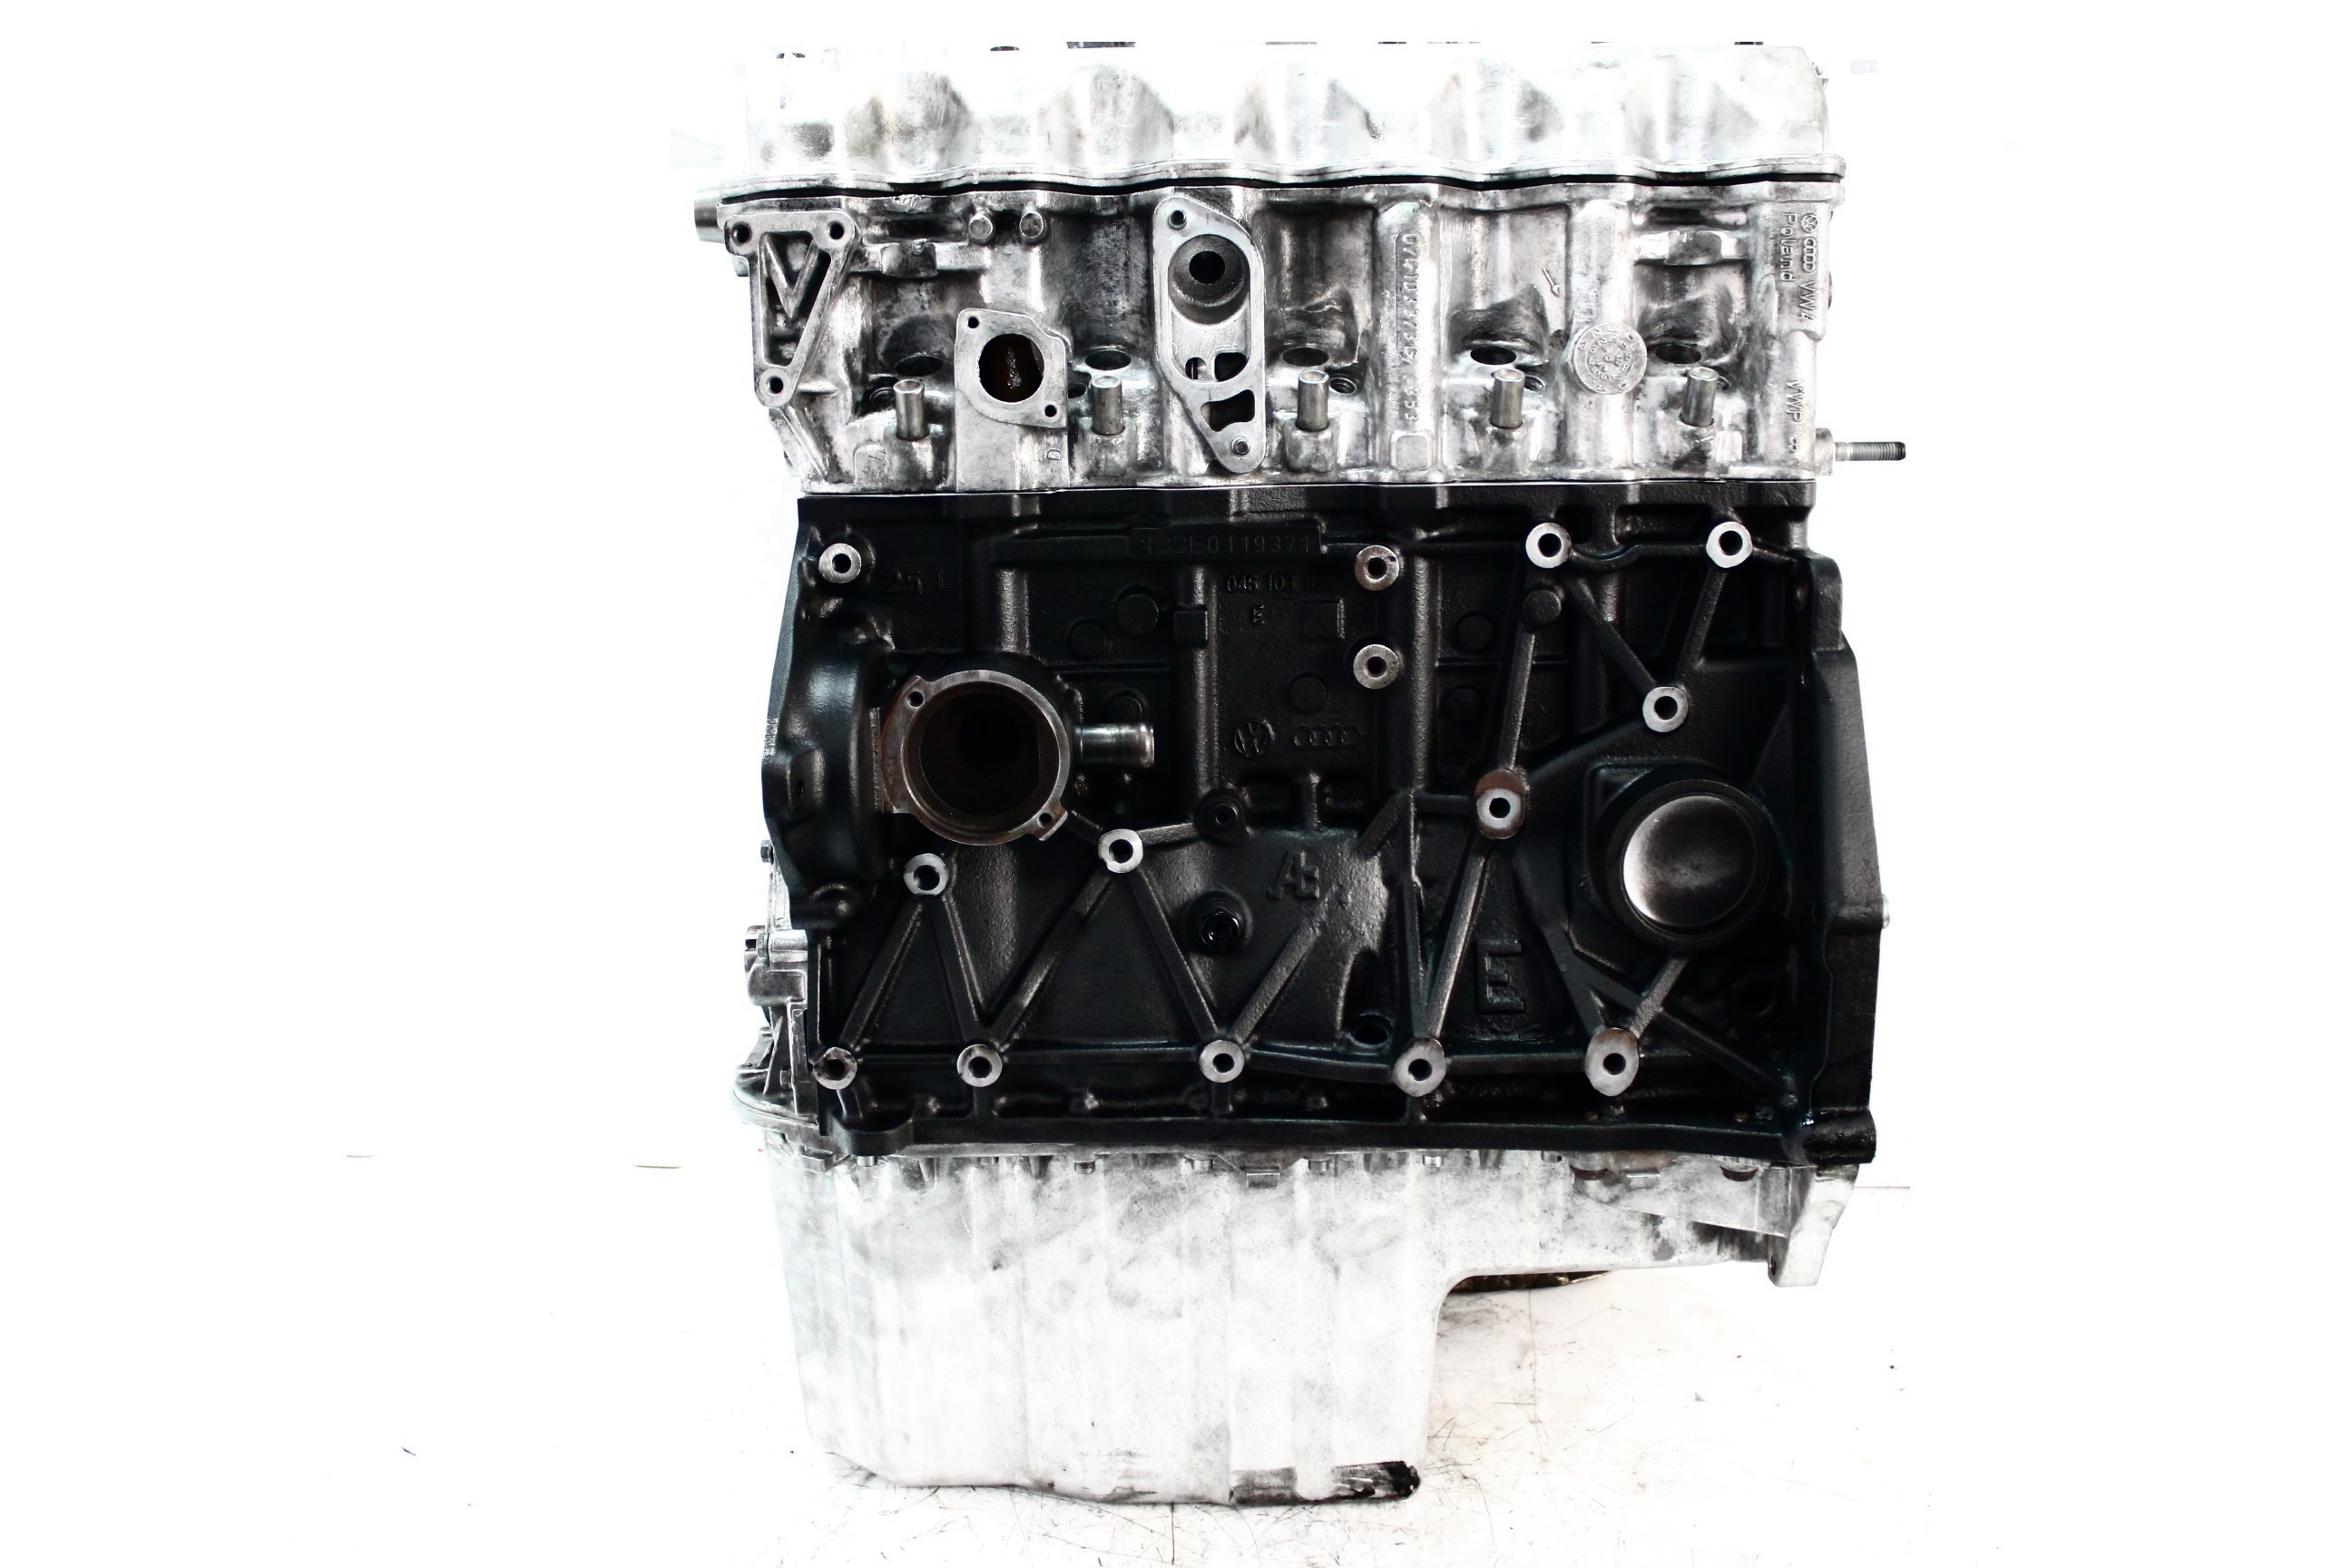 Motor 2004 VW 2,5 TDI Diesel BBE Baugleich: ANJ AHD